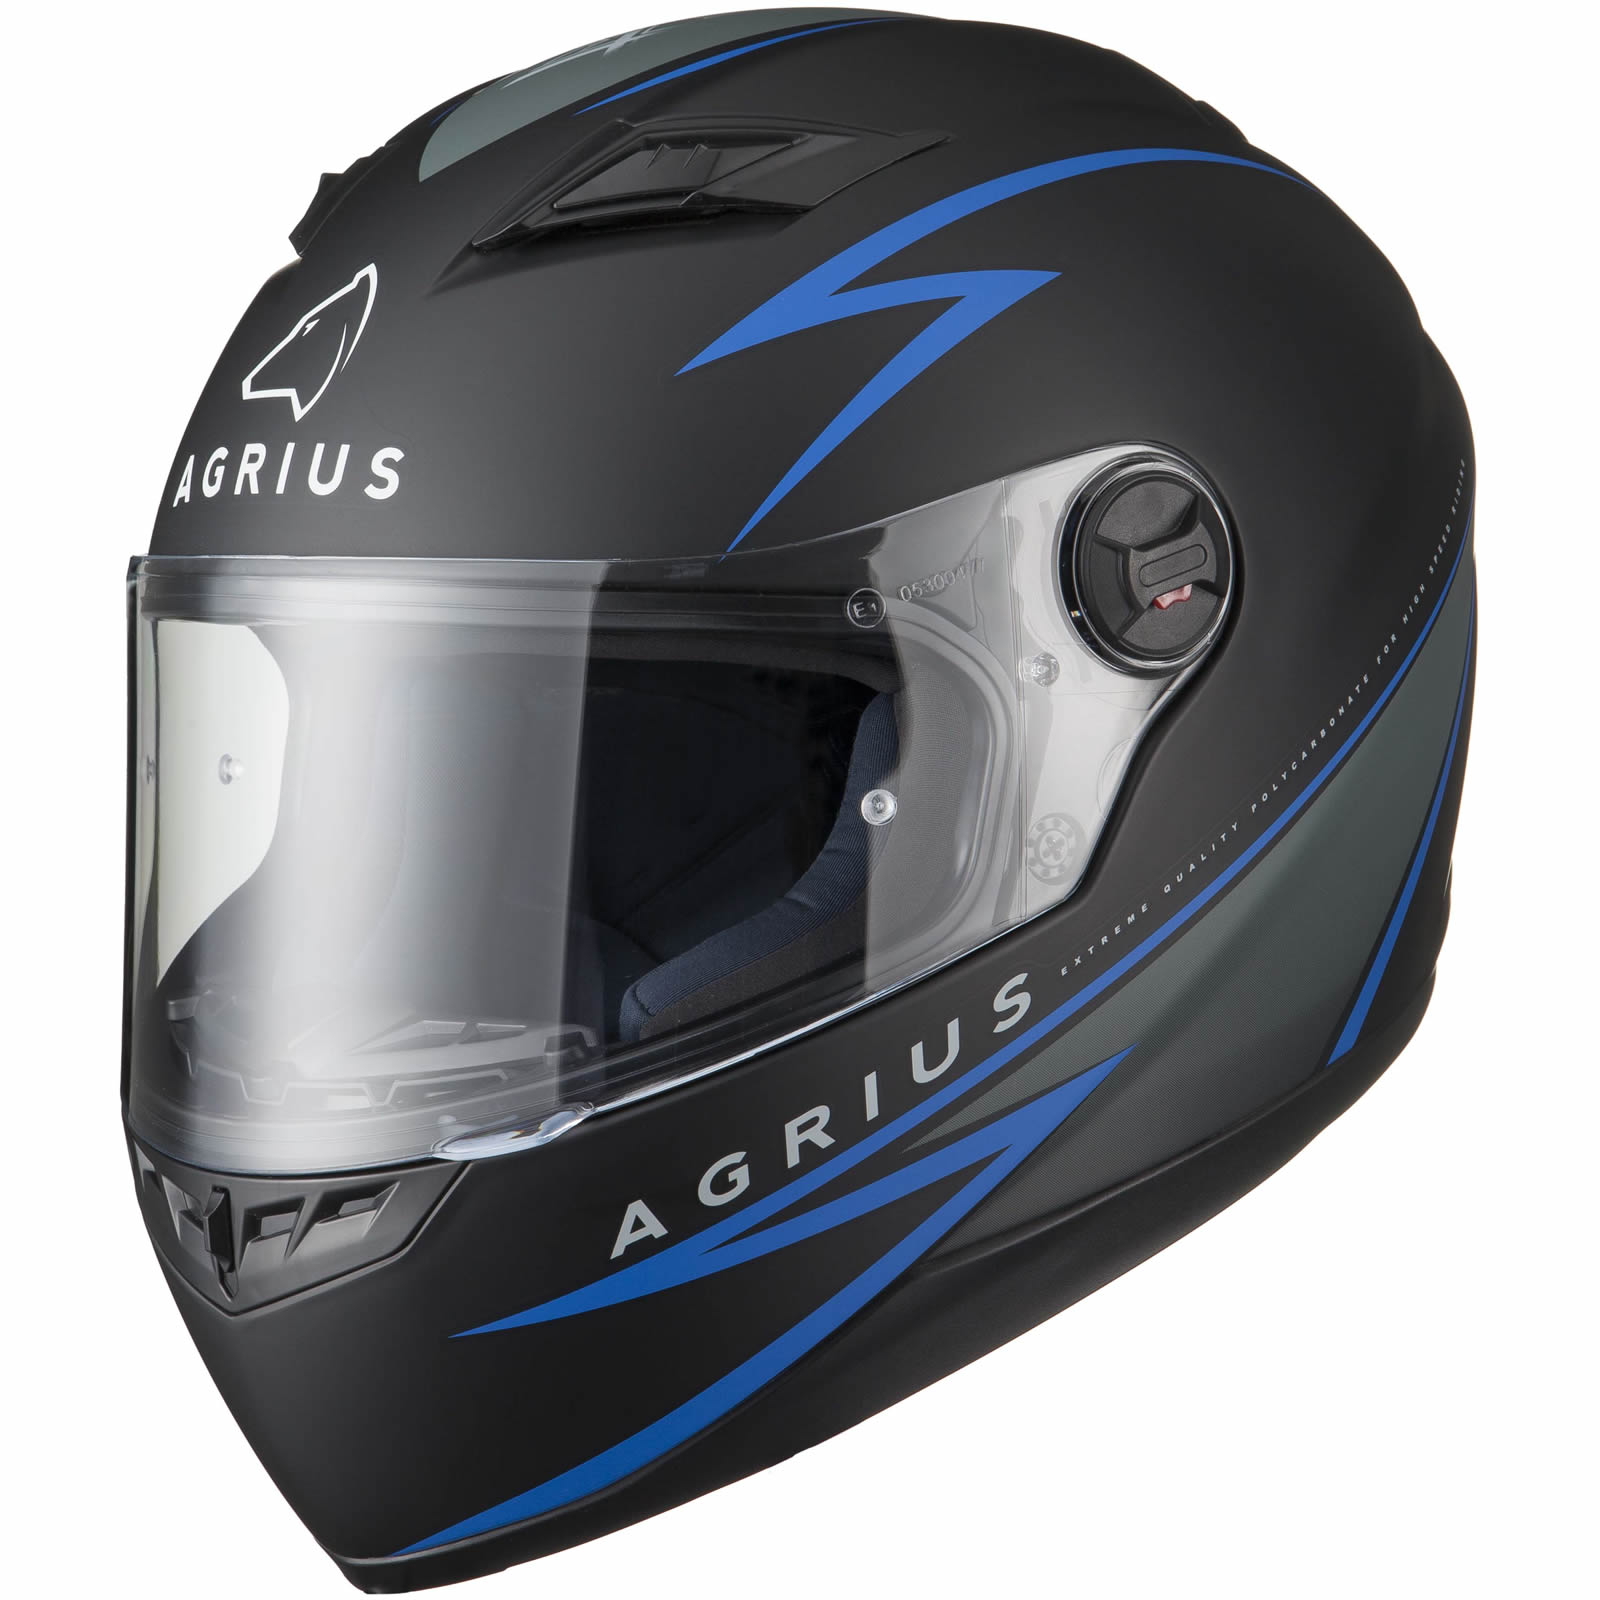 Agrius Rage Fuse Motorcycle Helmet Visor Bike Rider Full Face